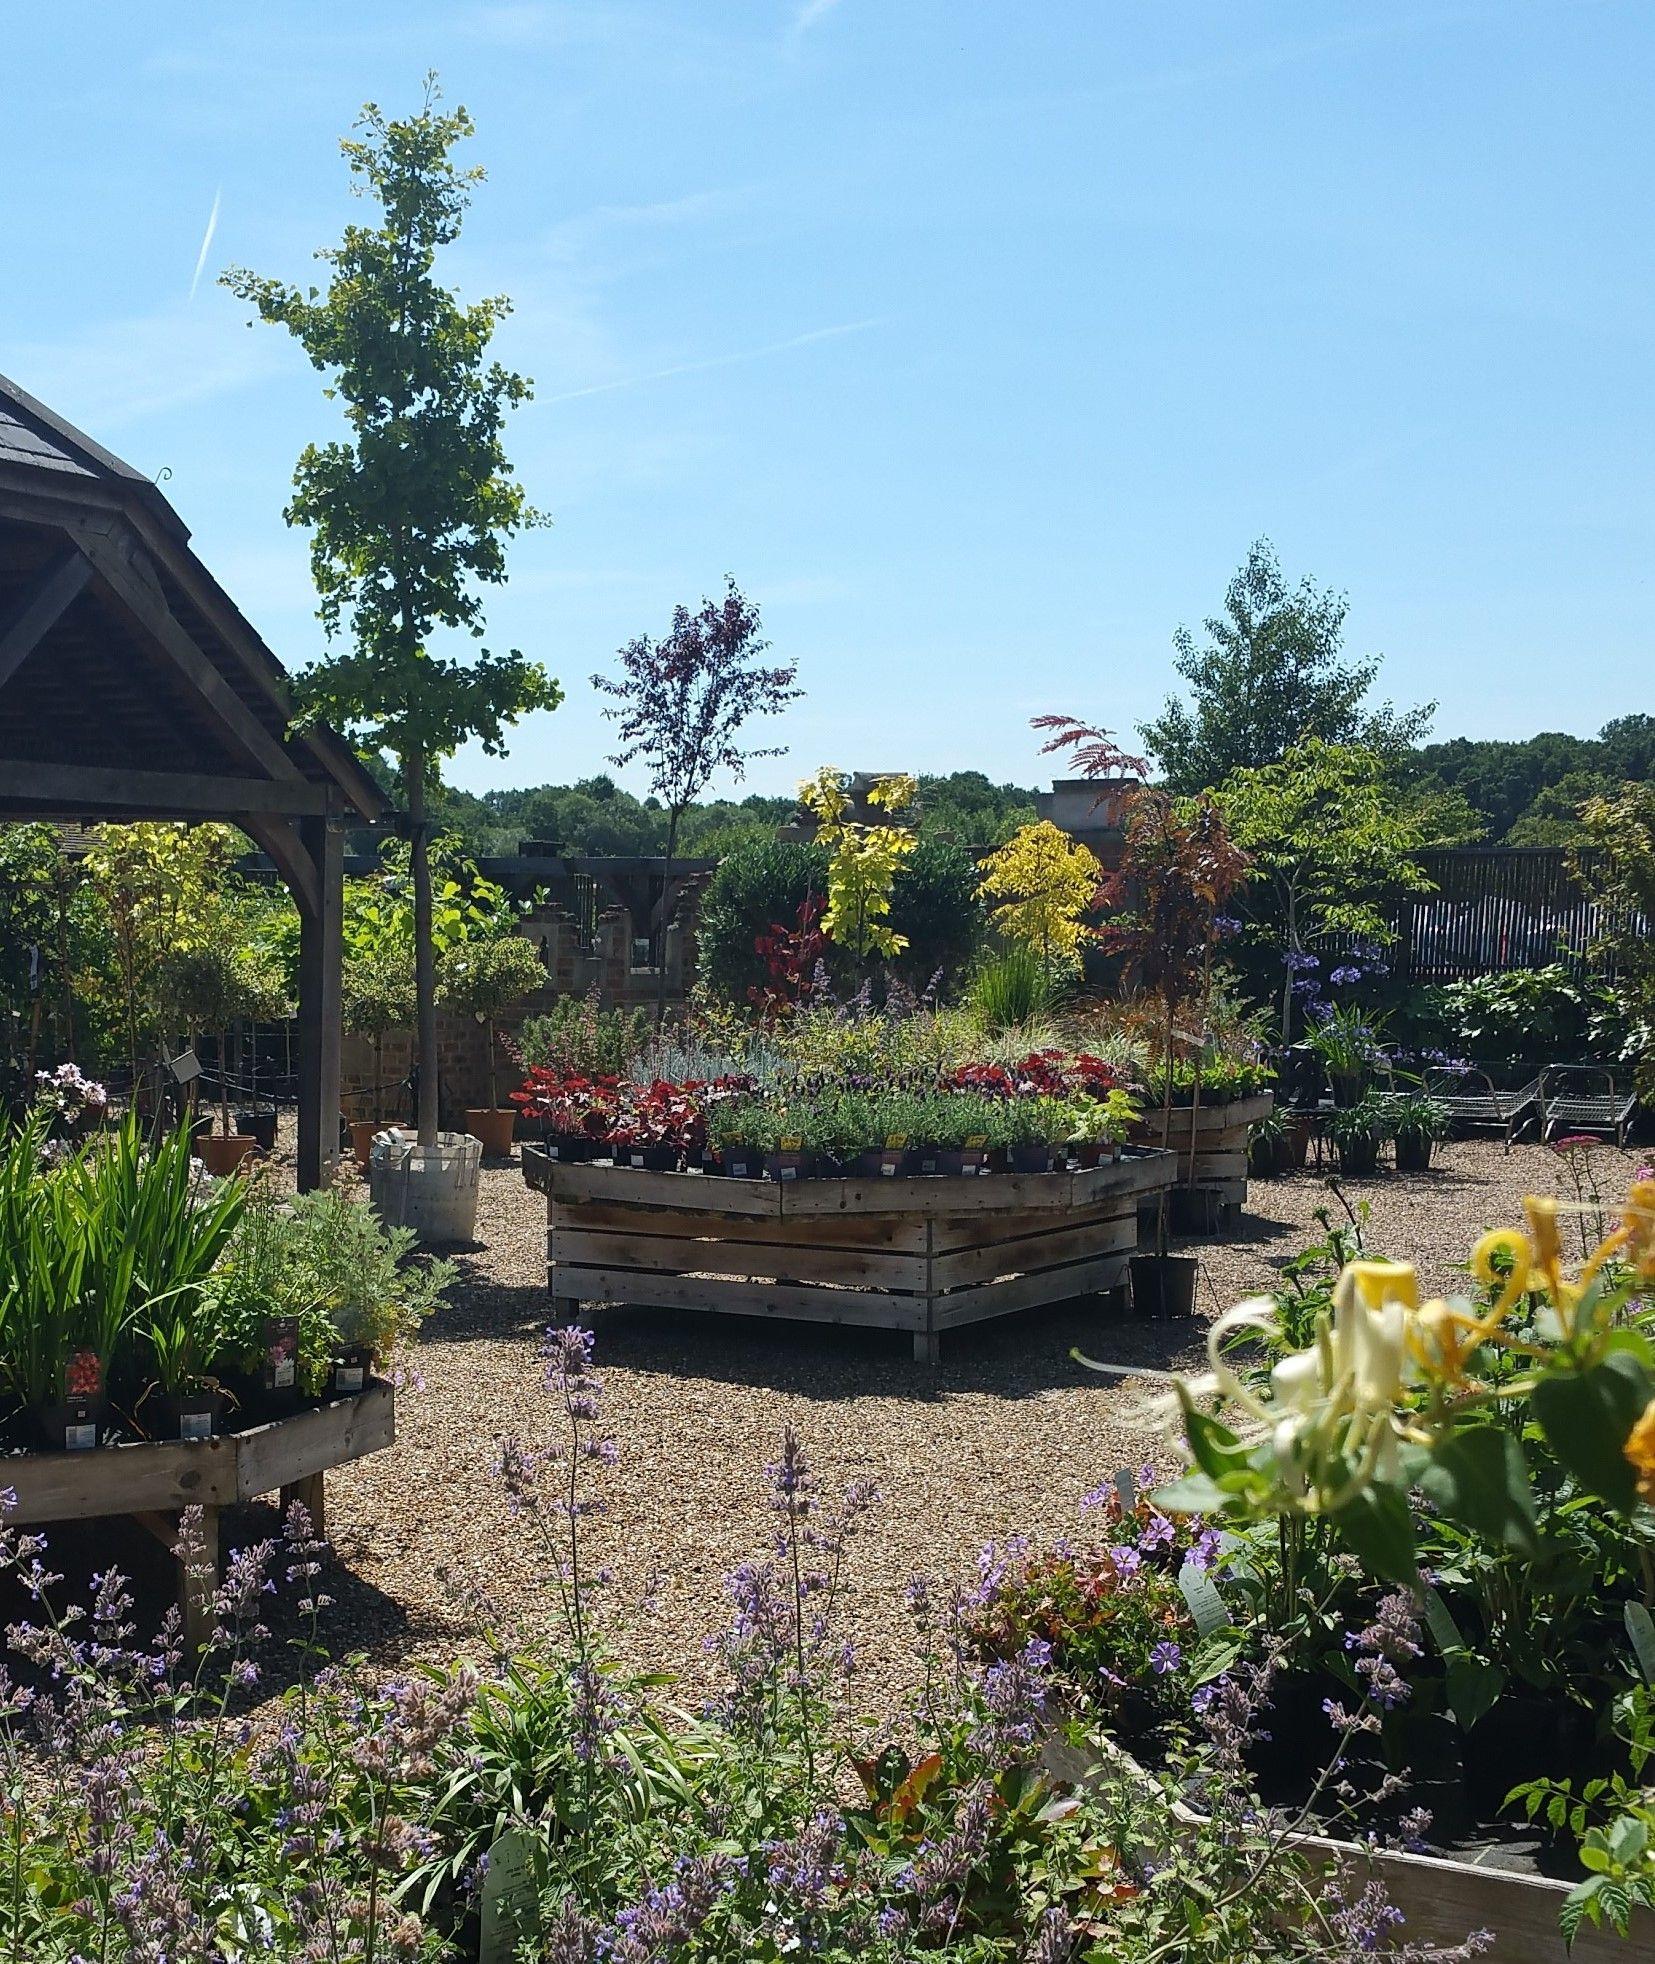 Seasonal Planting Displays At Cedar Nursery Cobham Surrey Uk Plants Plantnursery Garden Gardening